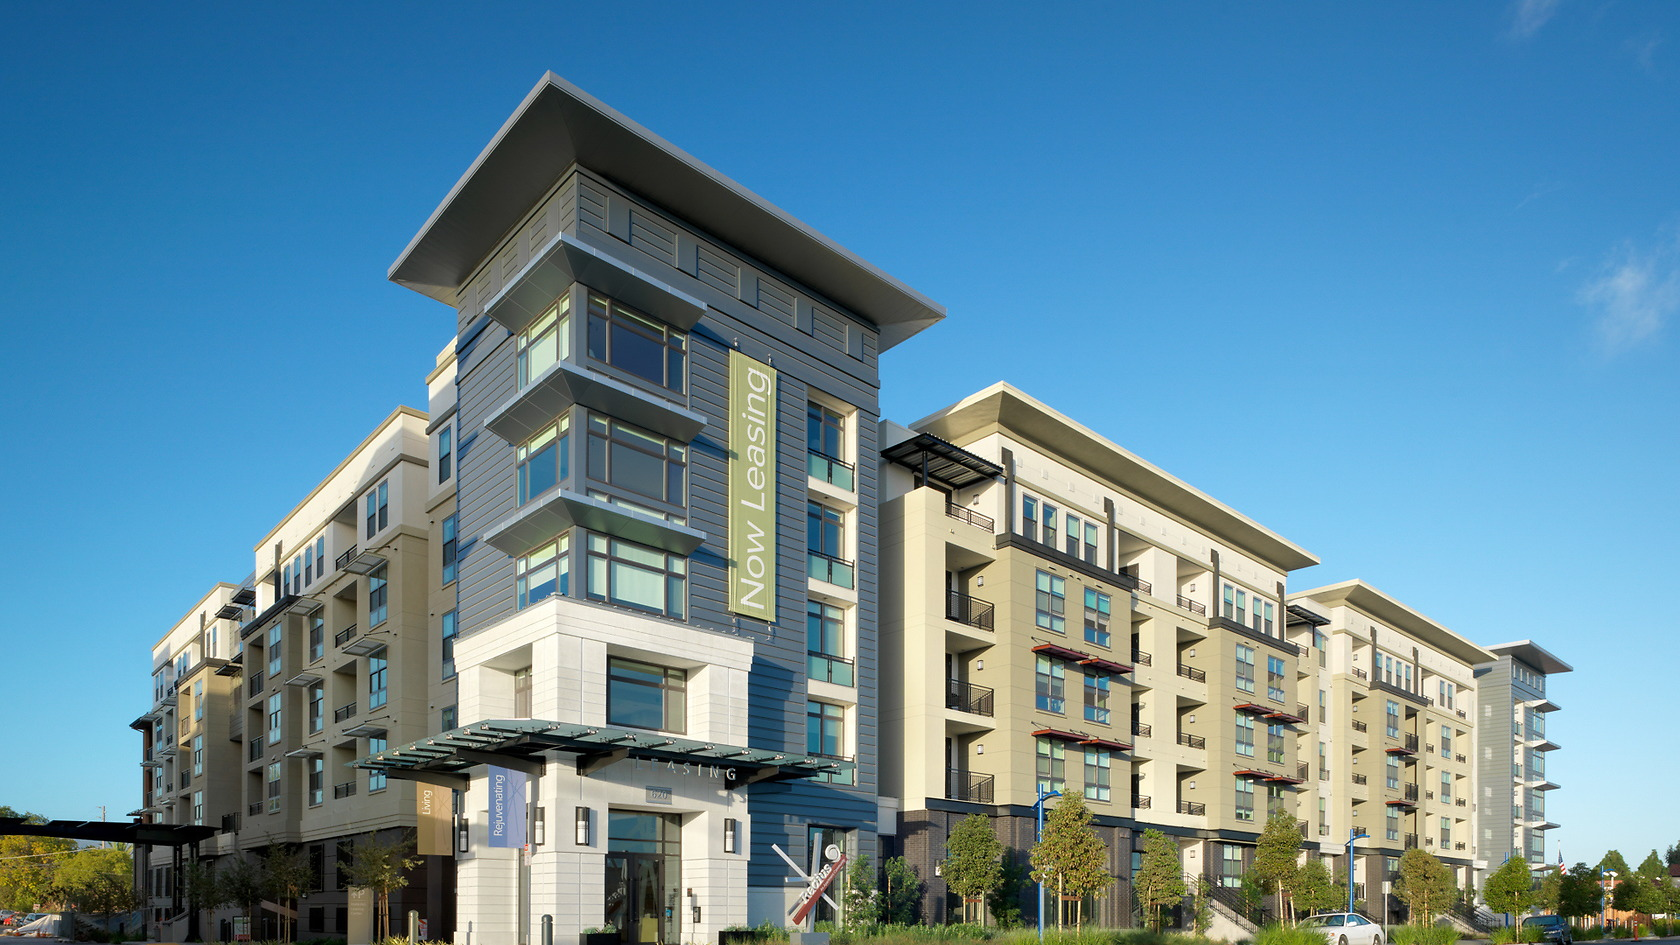 Radius Serviced Rental-Sample Image of Redwood City CA Nurse Housing